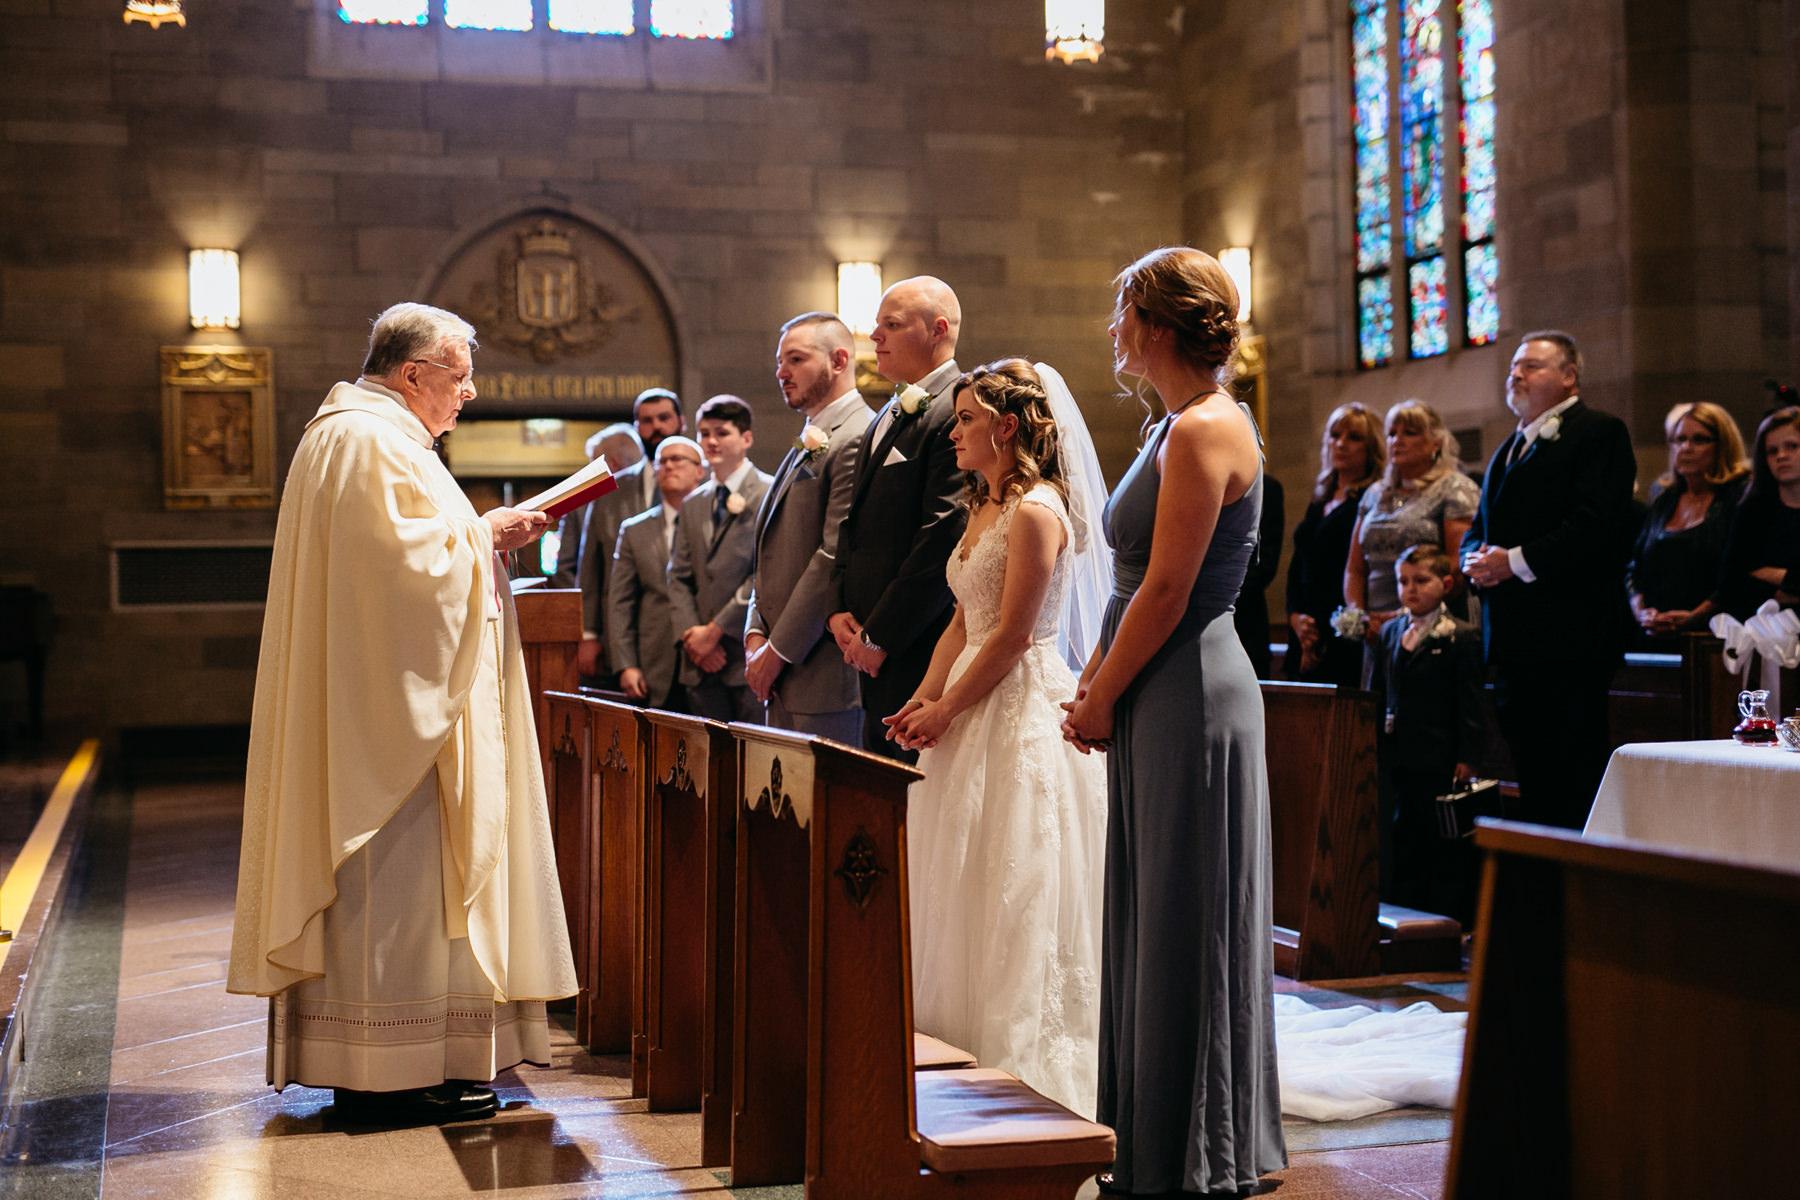 Quincy Ma Massachusetts Wedding Dedham Boston Granie Links Wedding New England Catholic Cathedral Liz Osban Photography 41.jpg